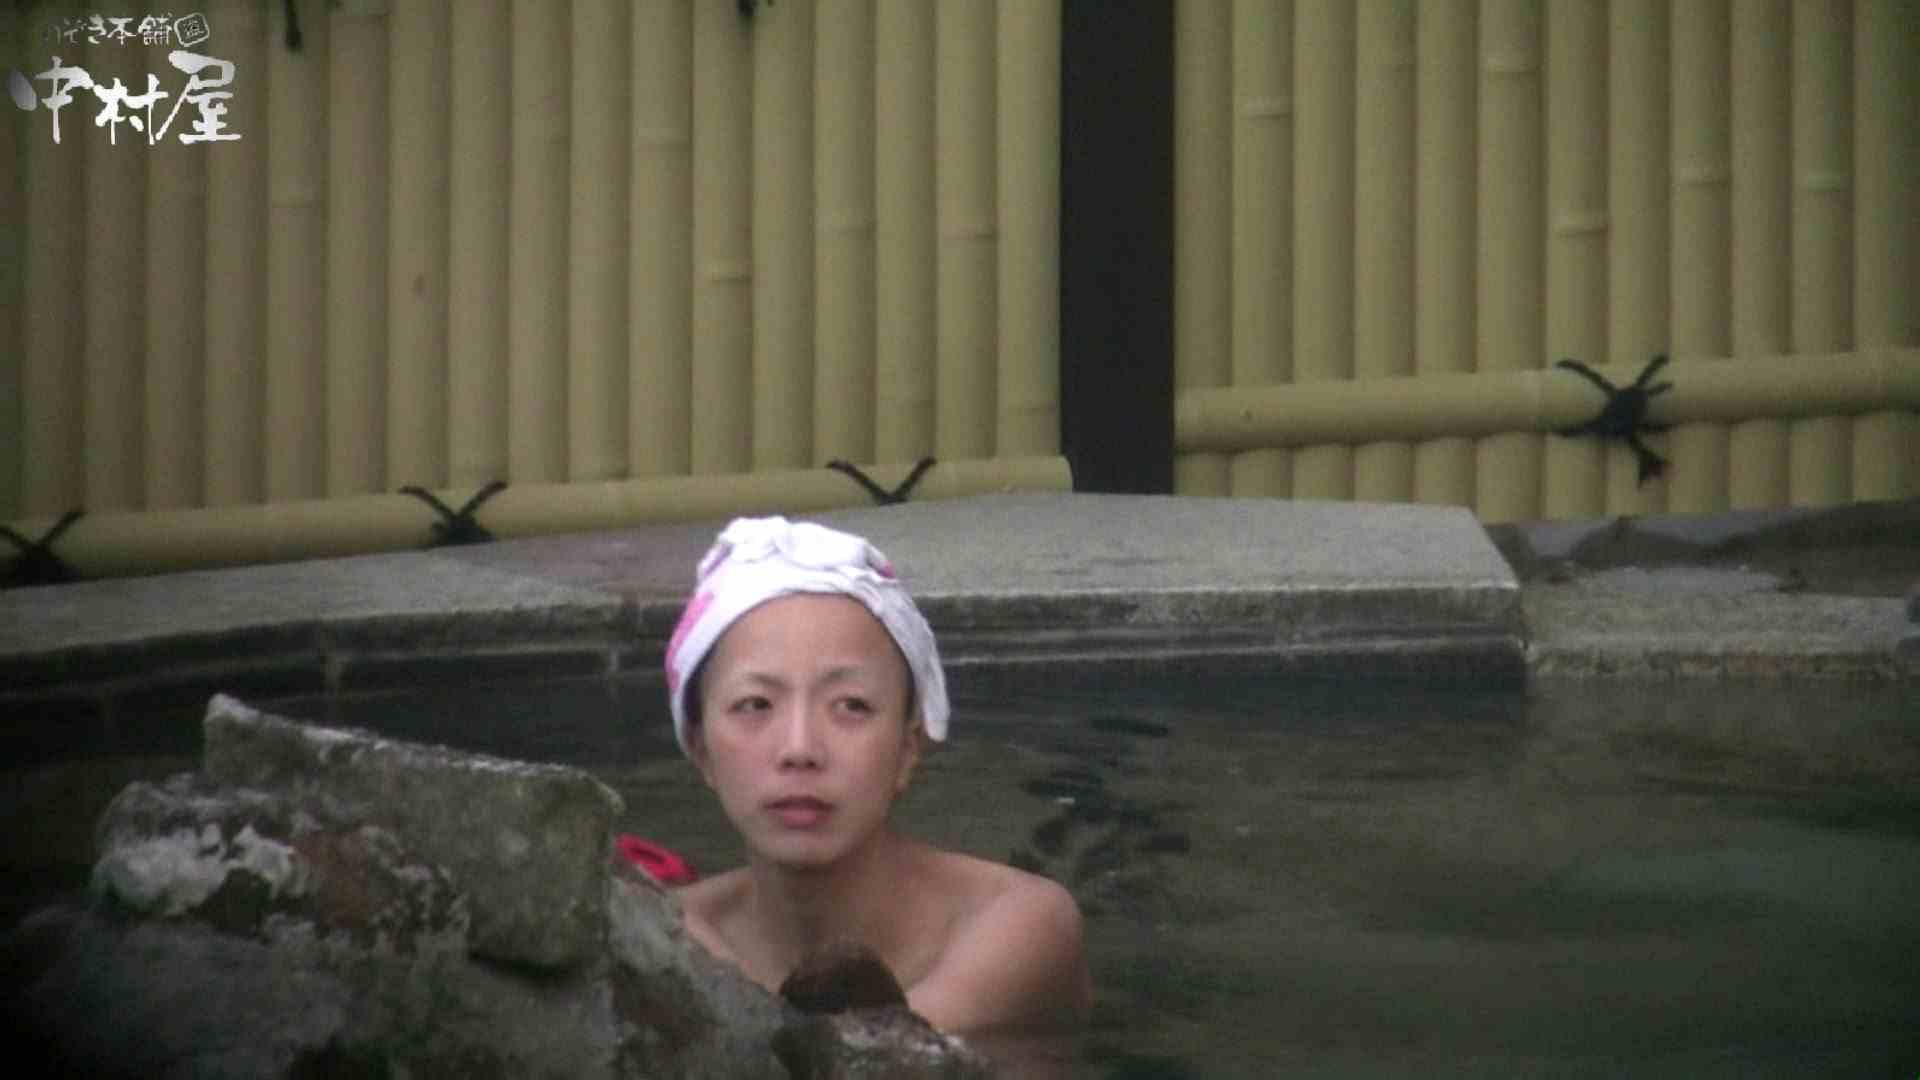 Aquaな露天風呂Vol.929 盗撮シリーズ   露天風呂編  94PIX 25